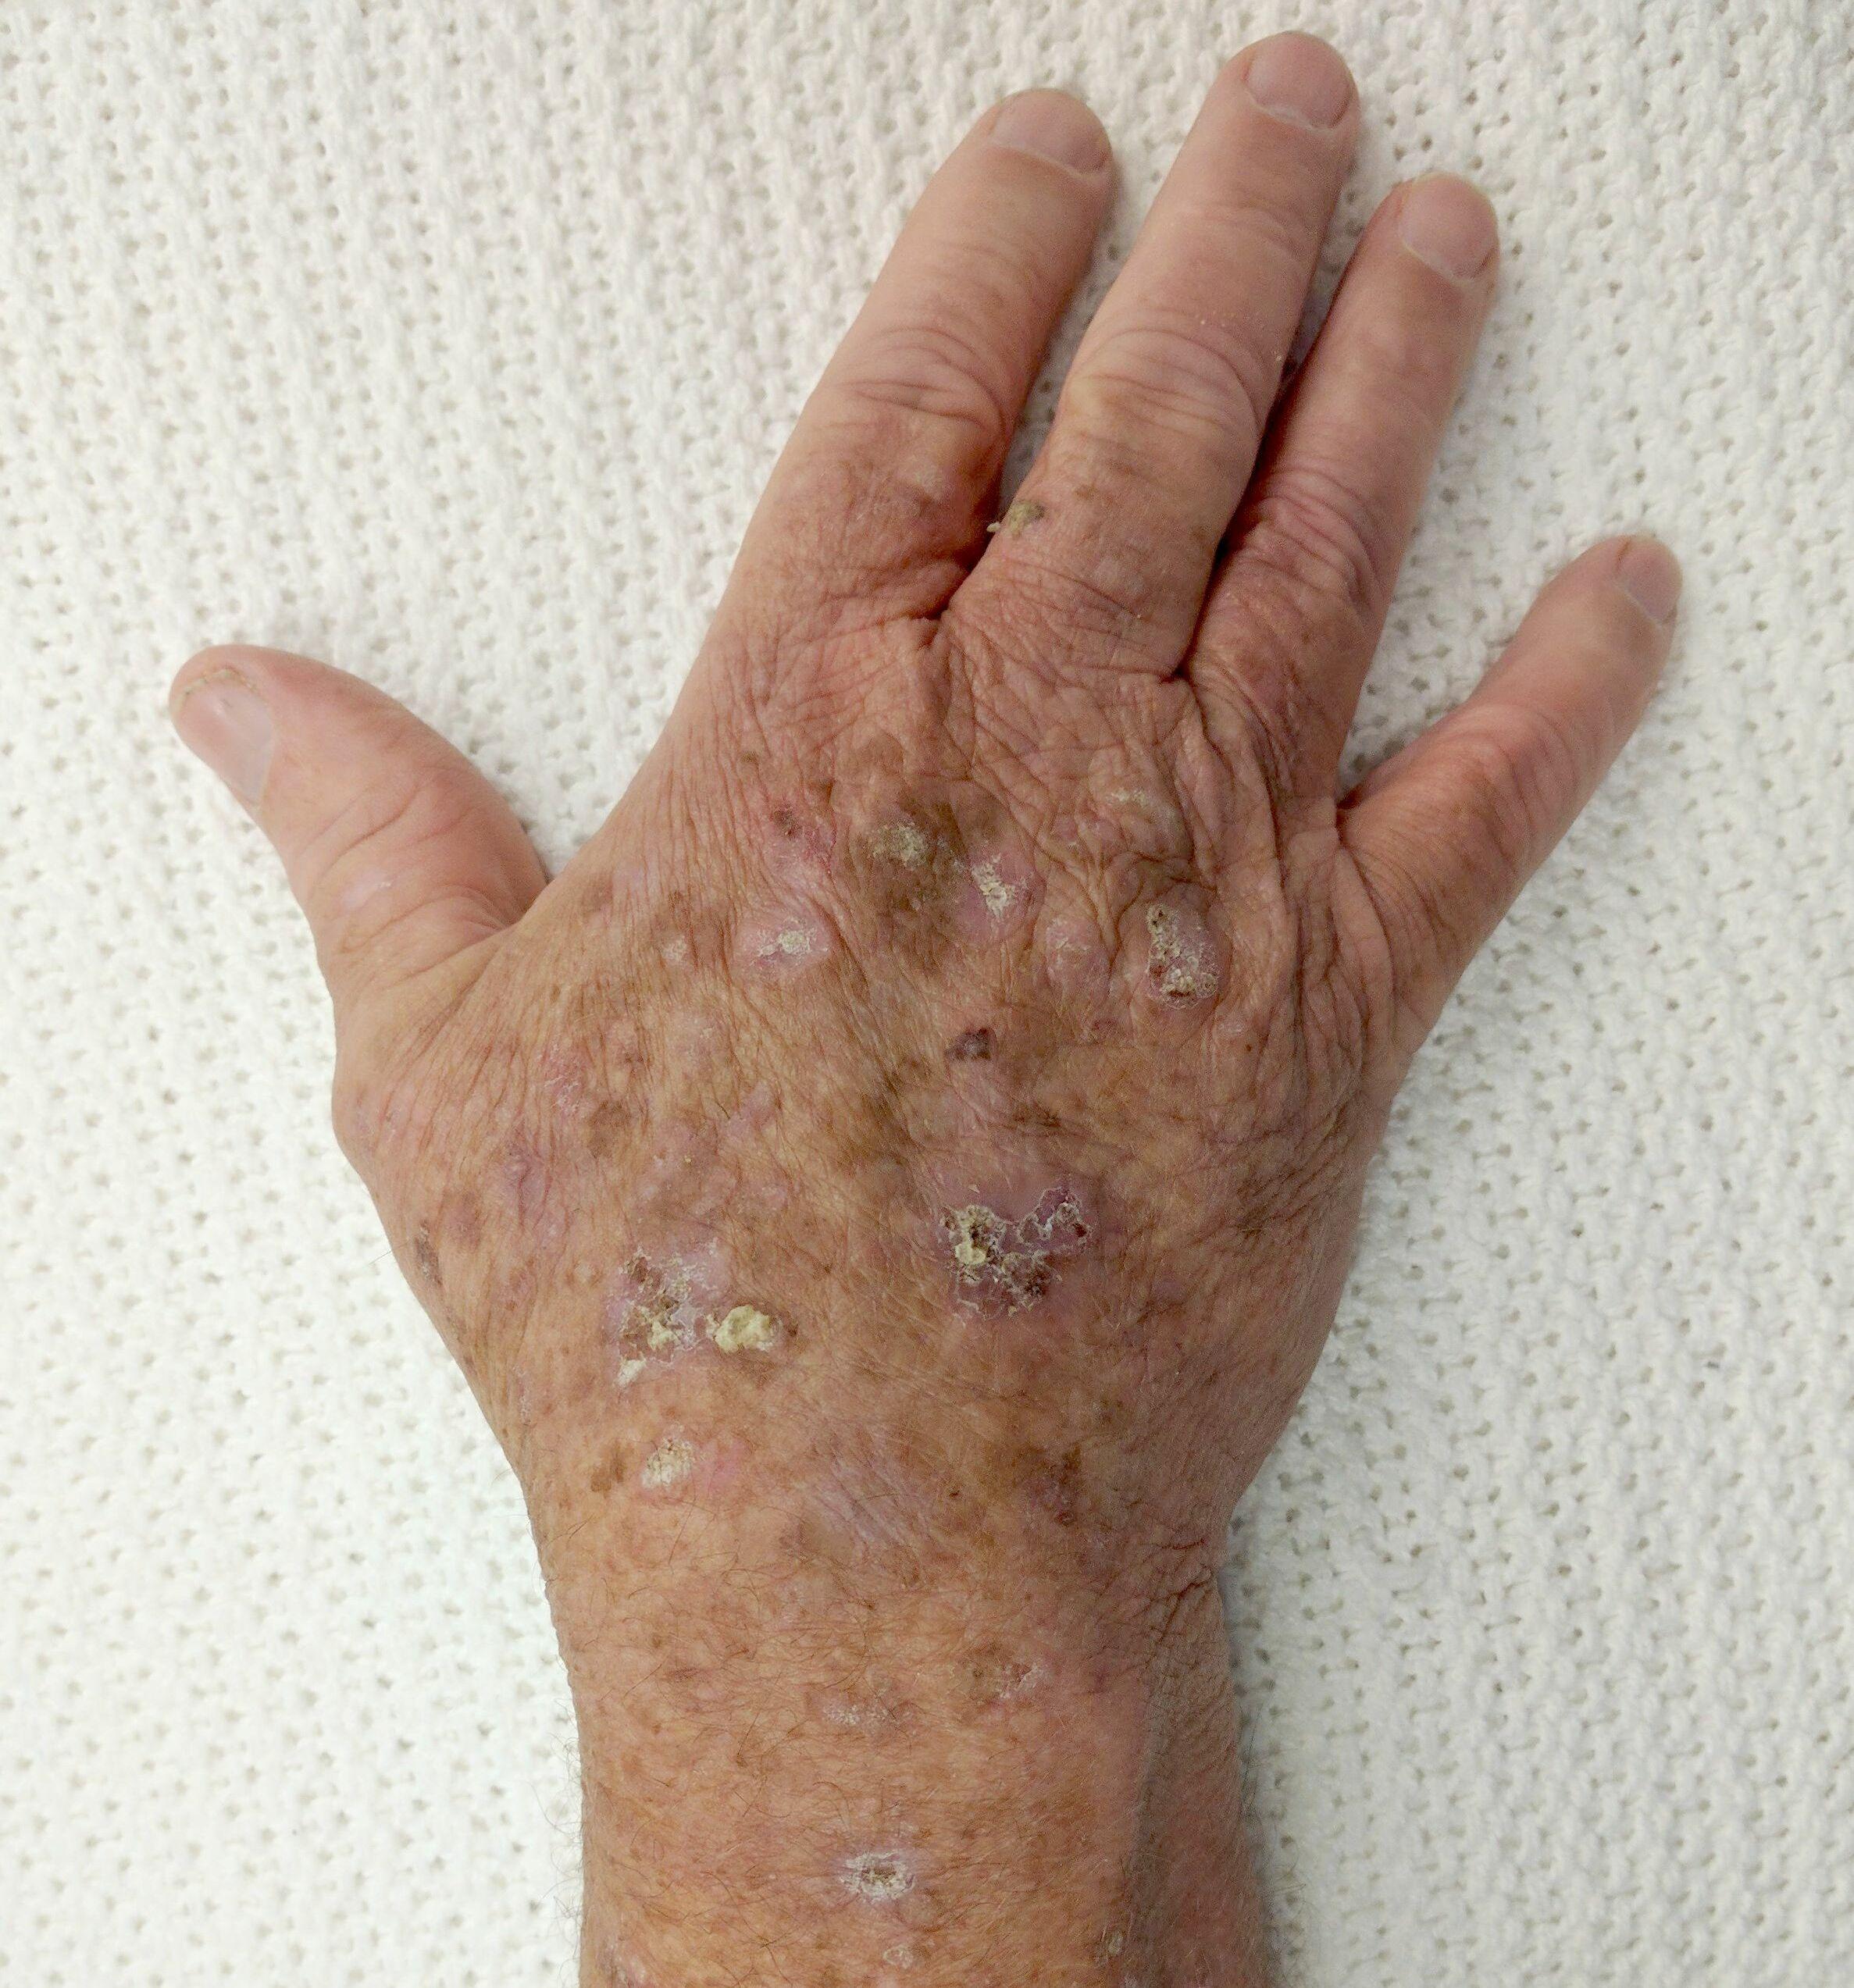 hpv lesions cream